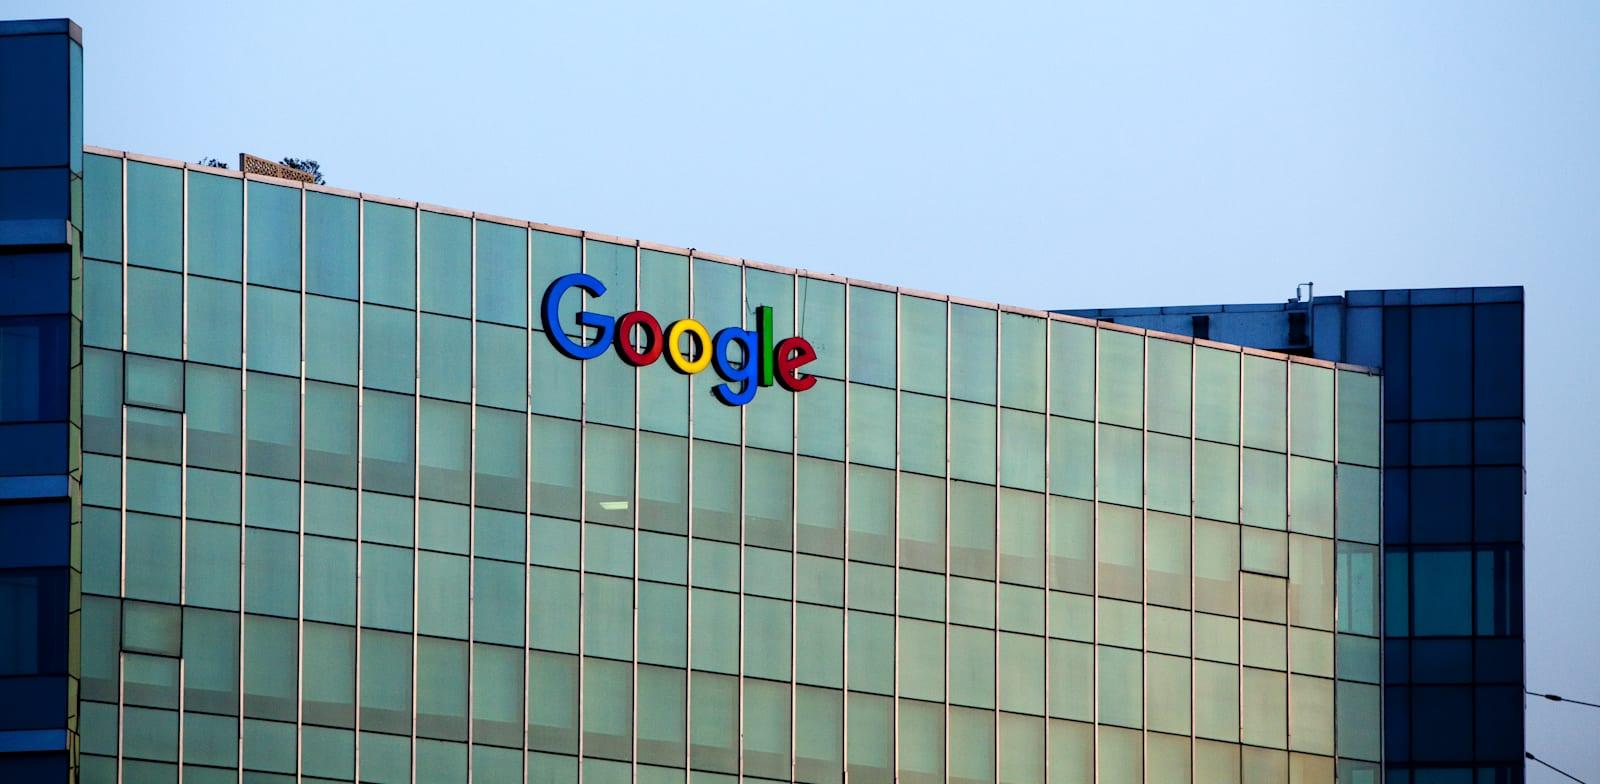 -CCI החלה לבחון את ההאשמות נגד גוגל / צילום: Shutterstock, Heide Pinkall